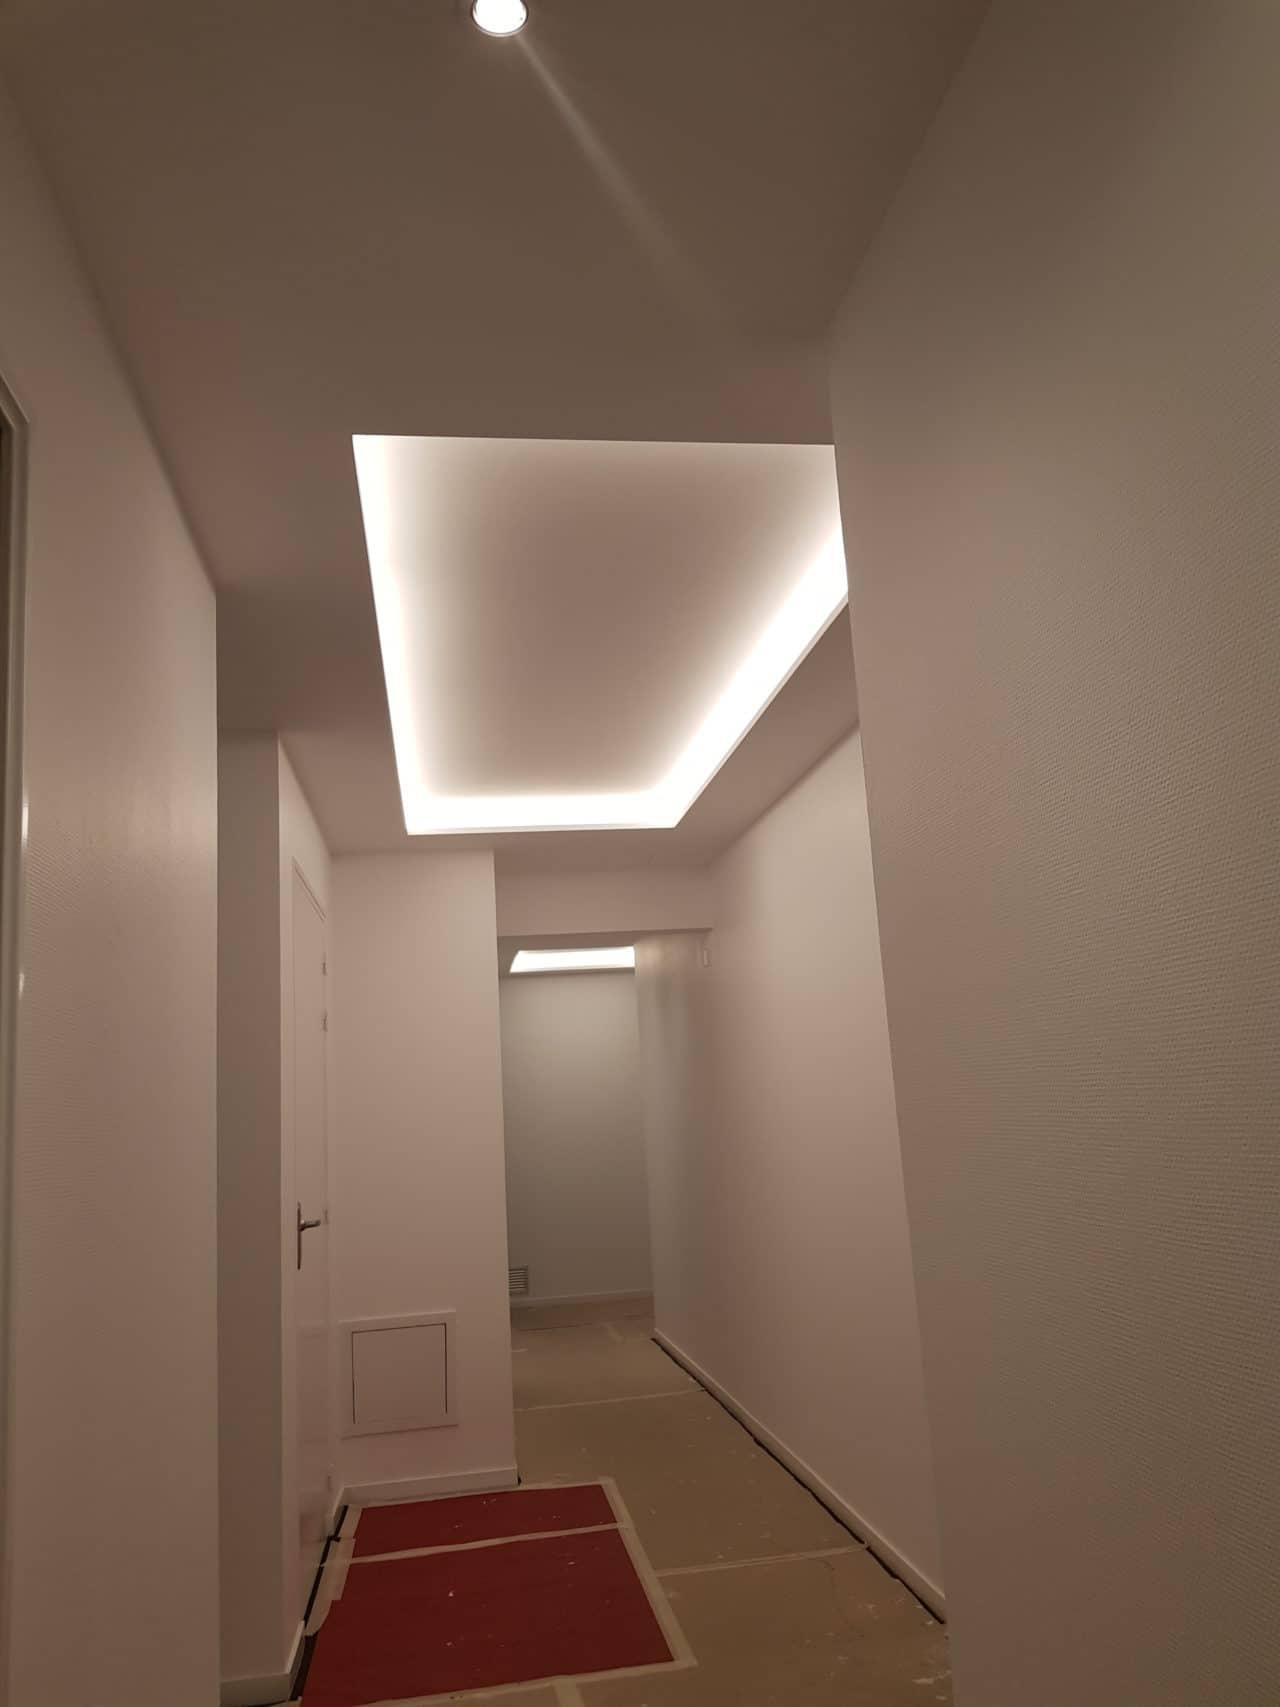 Plafond plaque de plâtre avec gorge lumineuse, circulation bureau